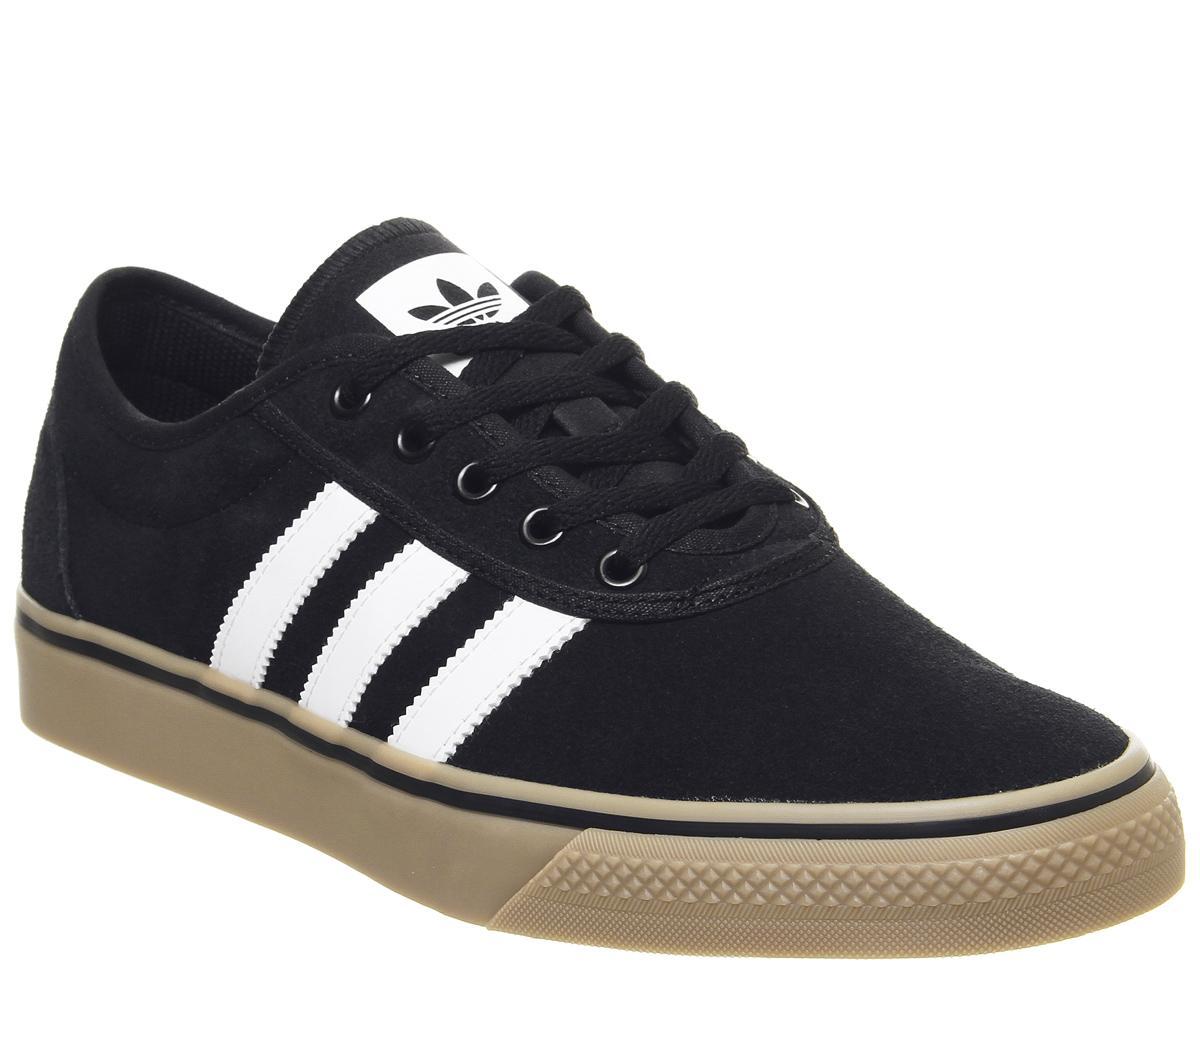 adidas Adi Ease Trainers Black Gum